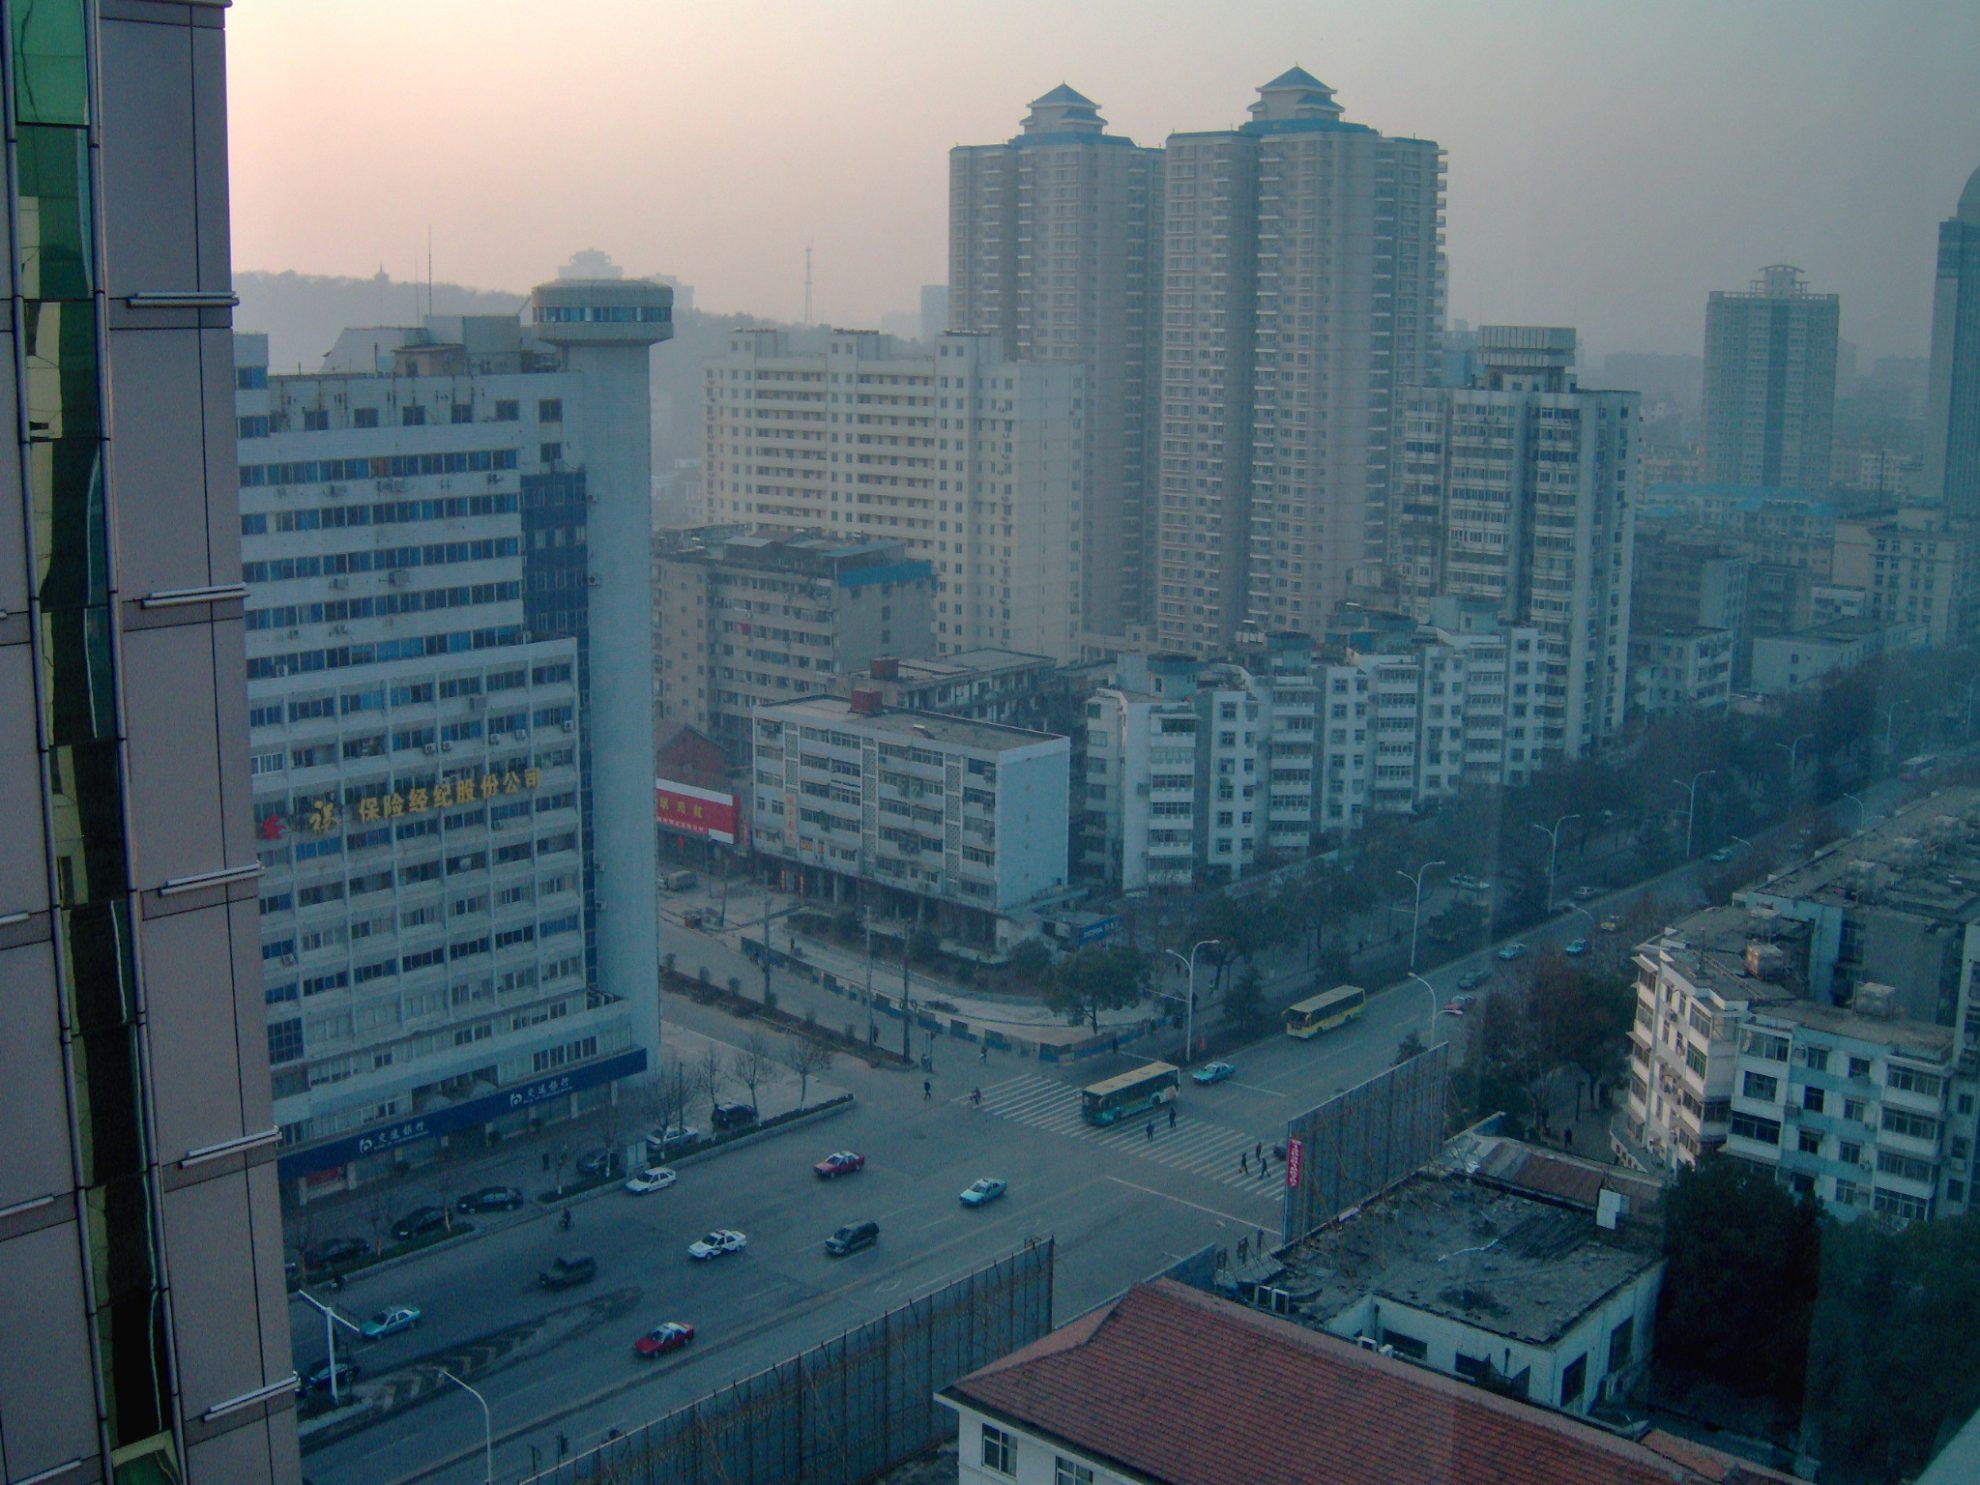 Gelderland leidt waterstofmissie naar China